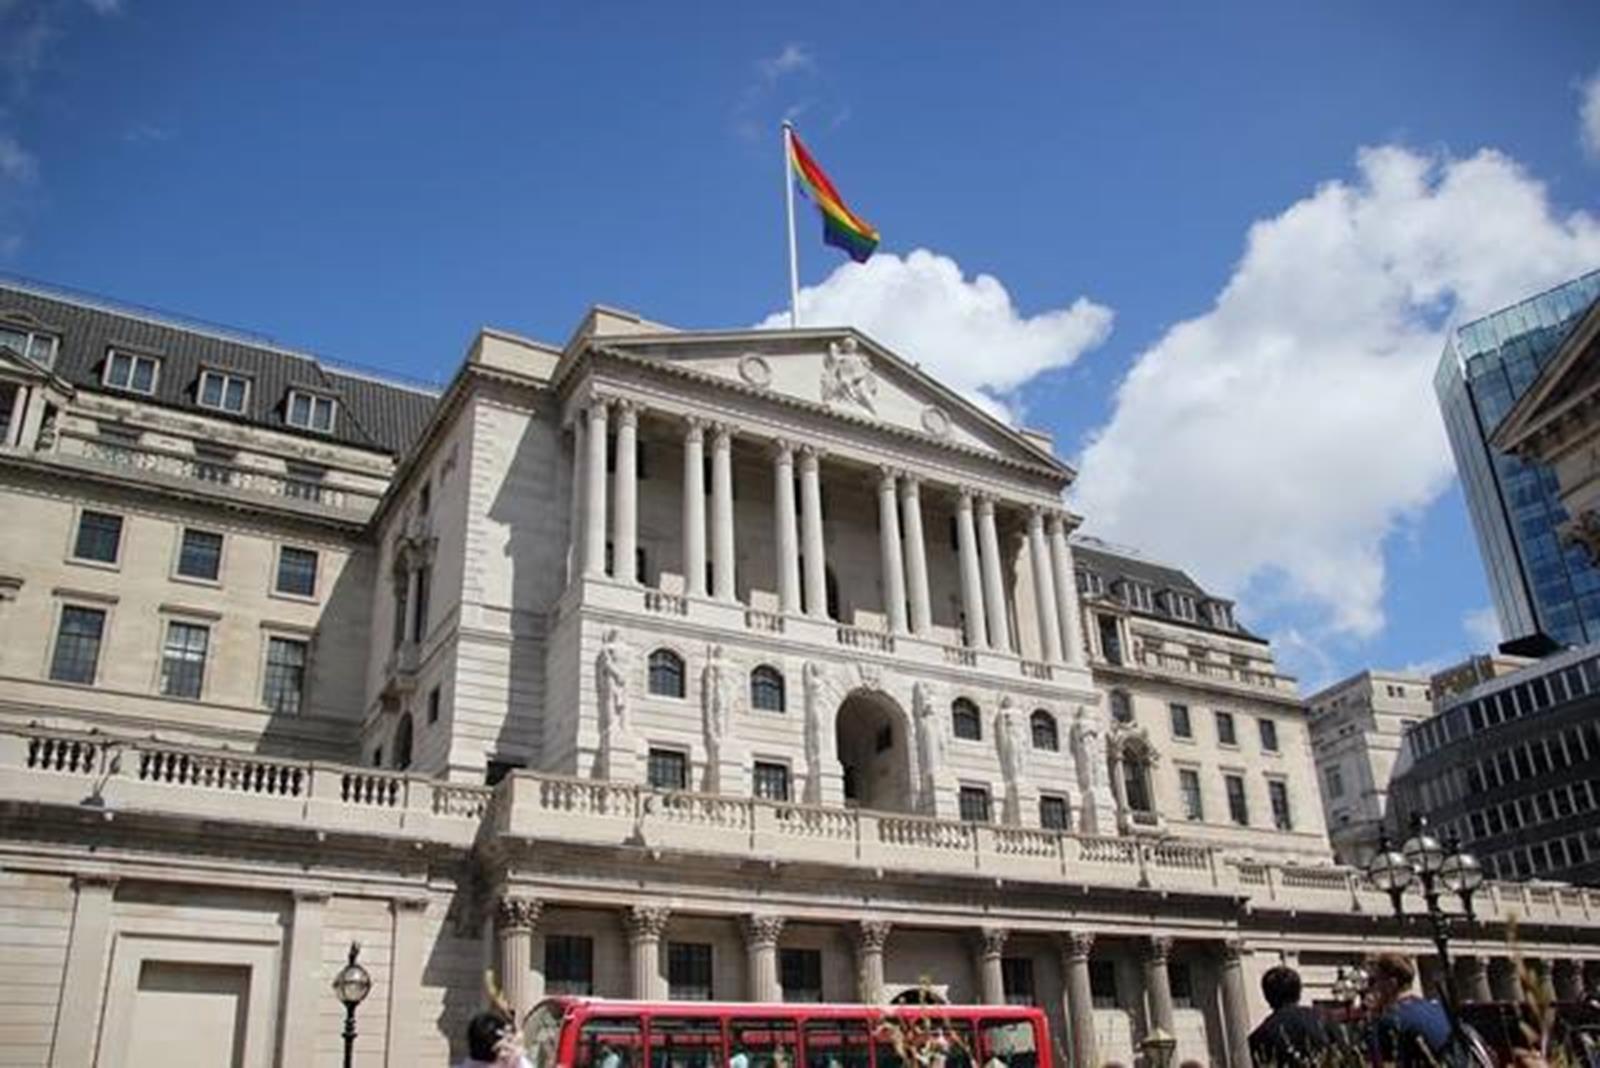 35784-bank-of-england-museum-london-01.jpg